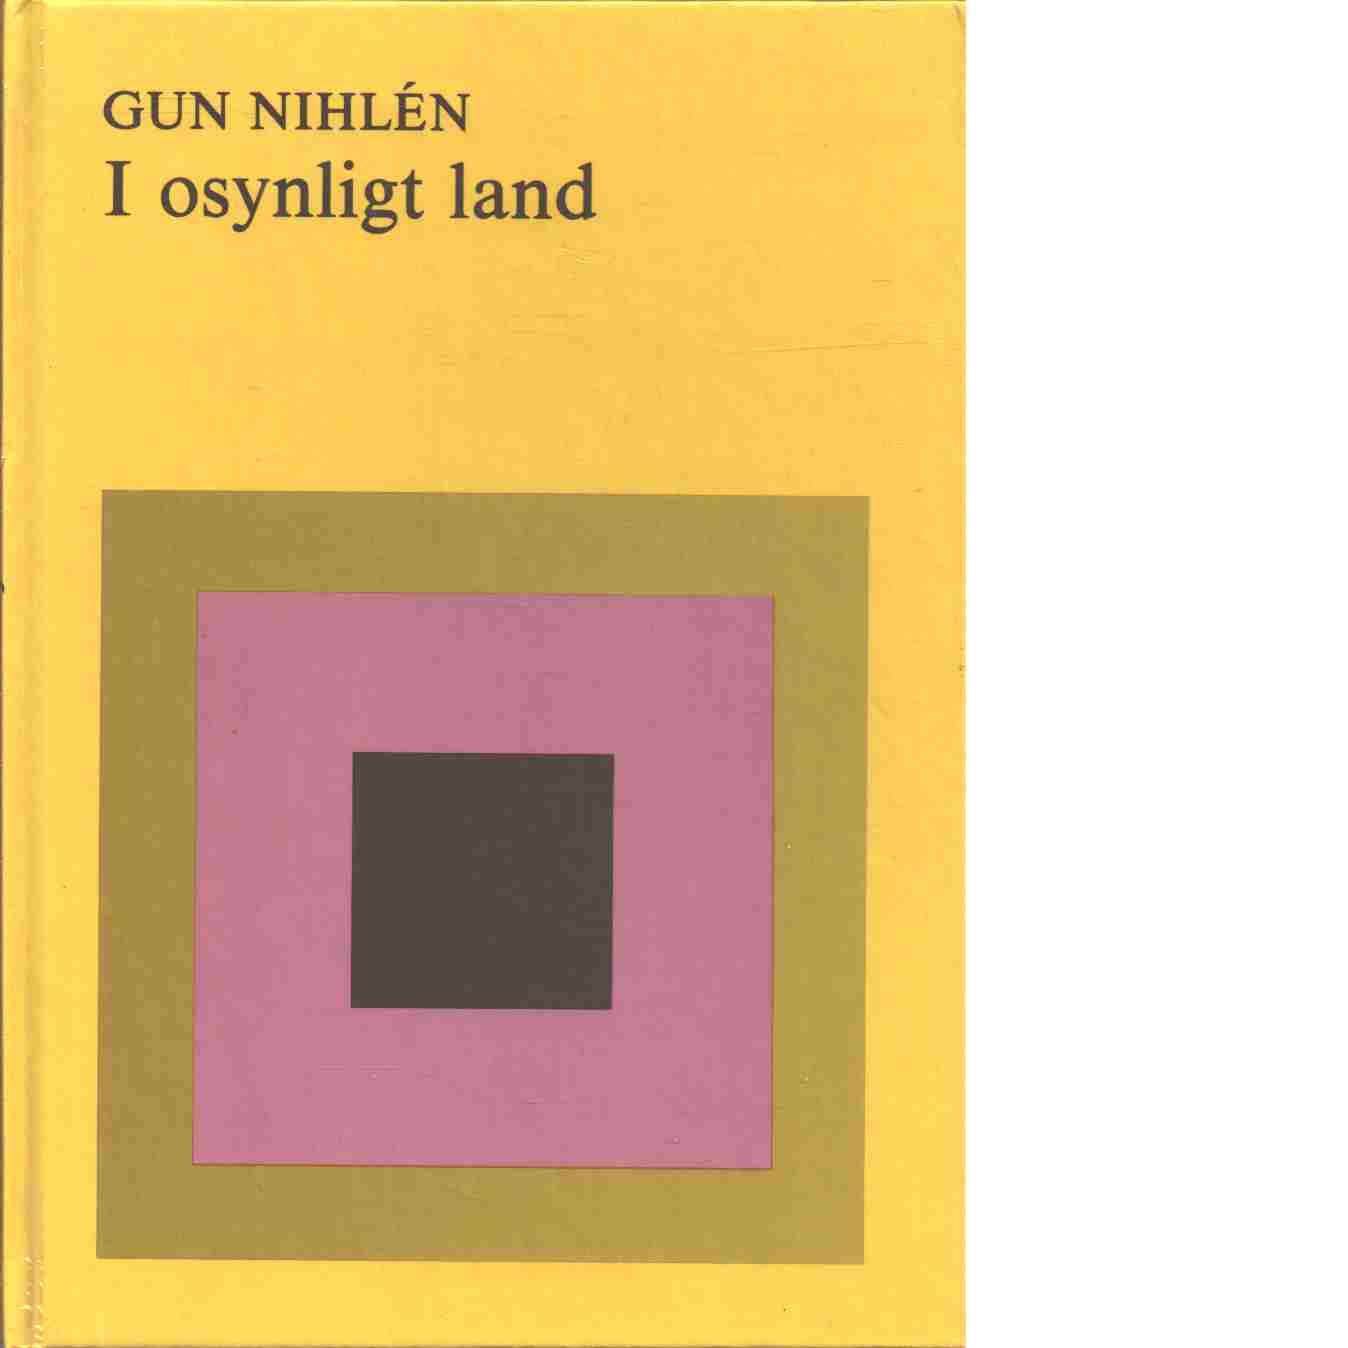 I osynligt land - Nihlén, Gun